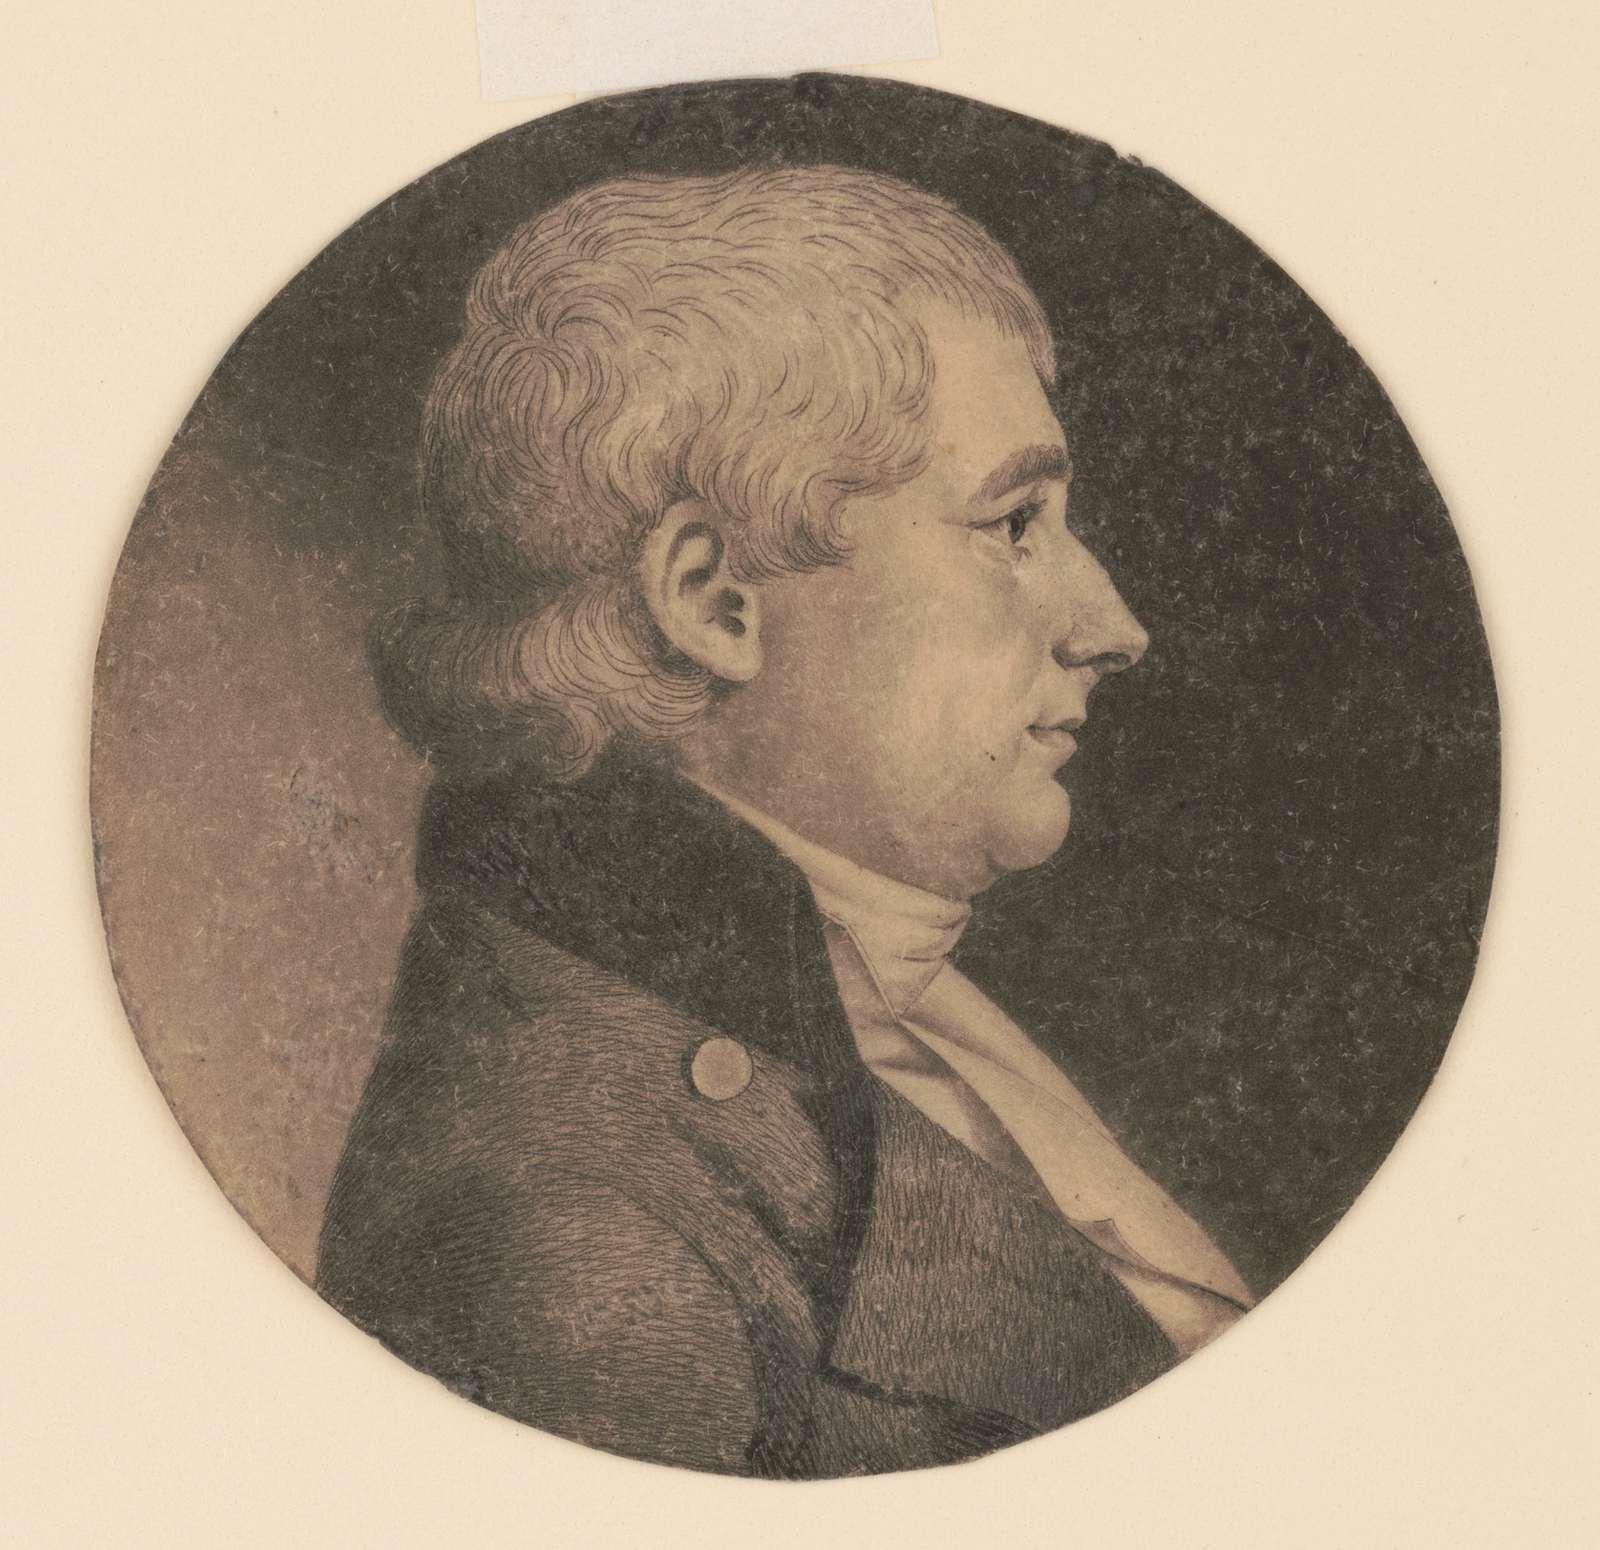 John Smith, head-and-shoulders portrait, right profile